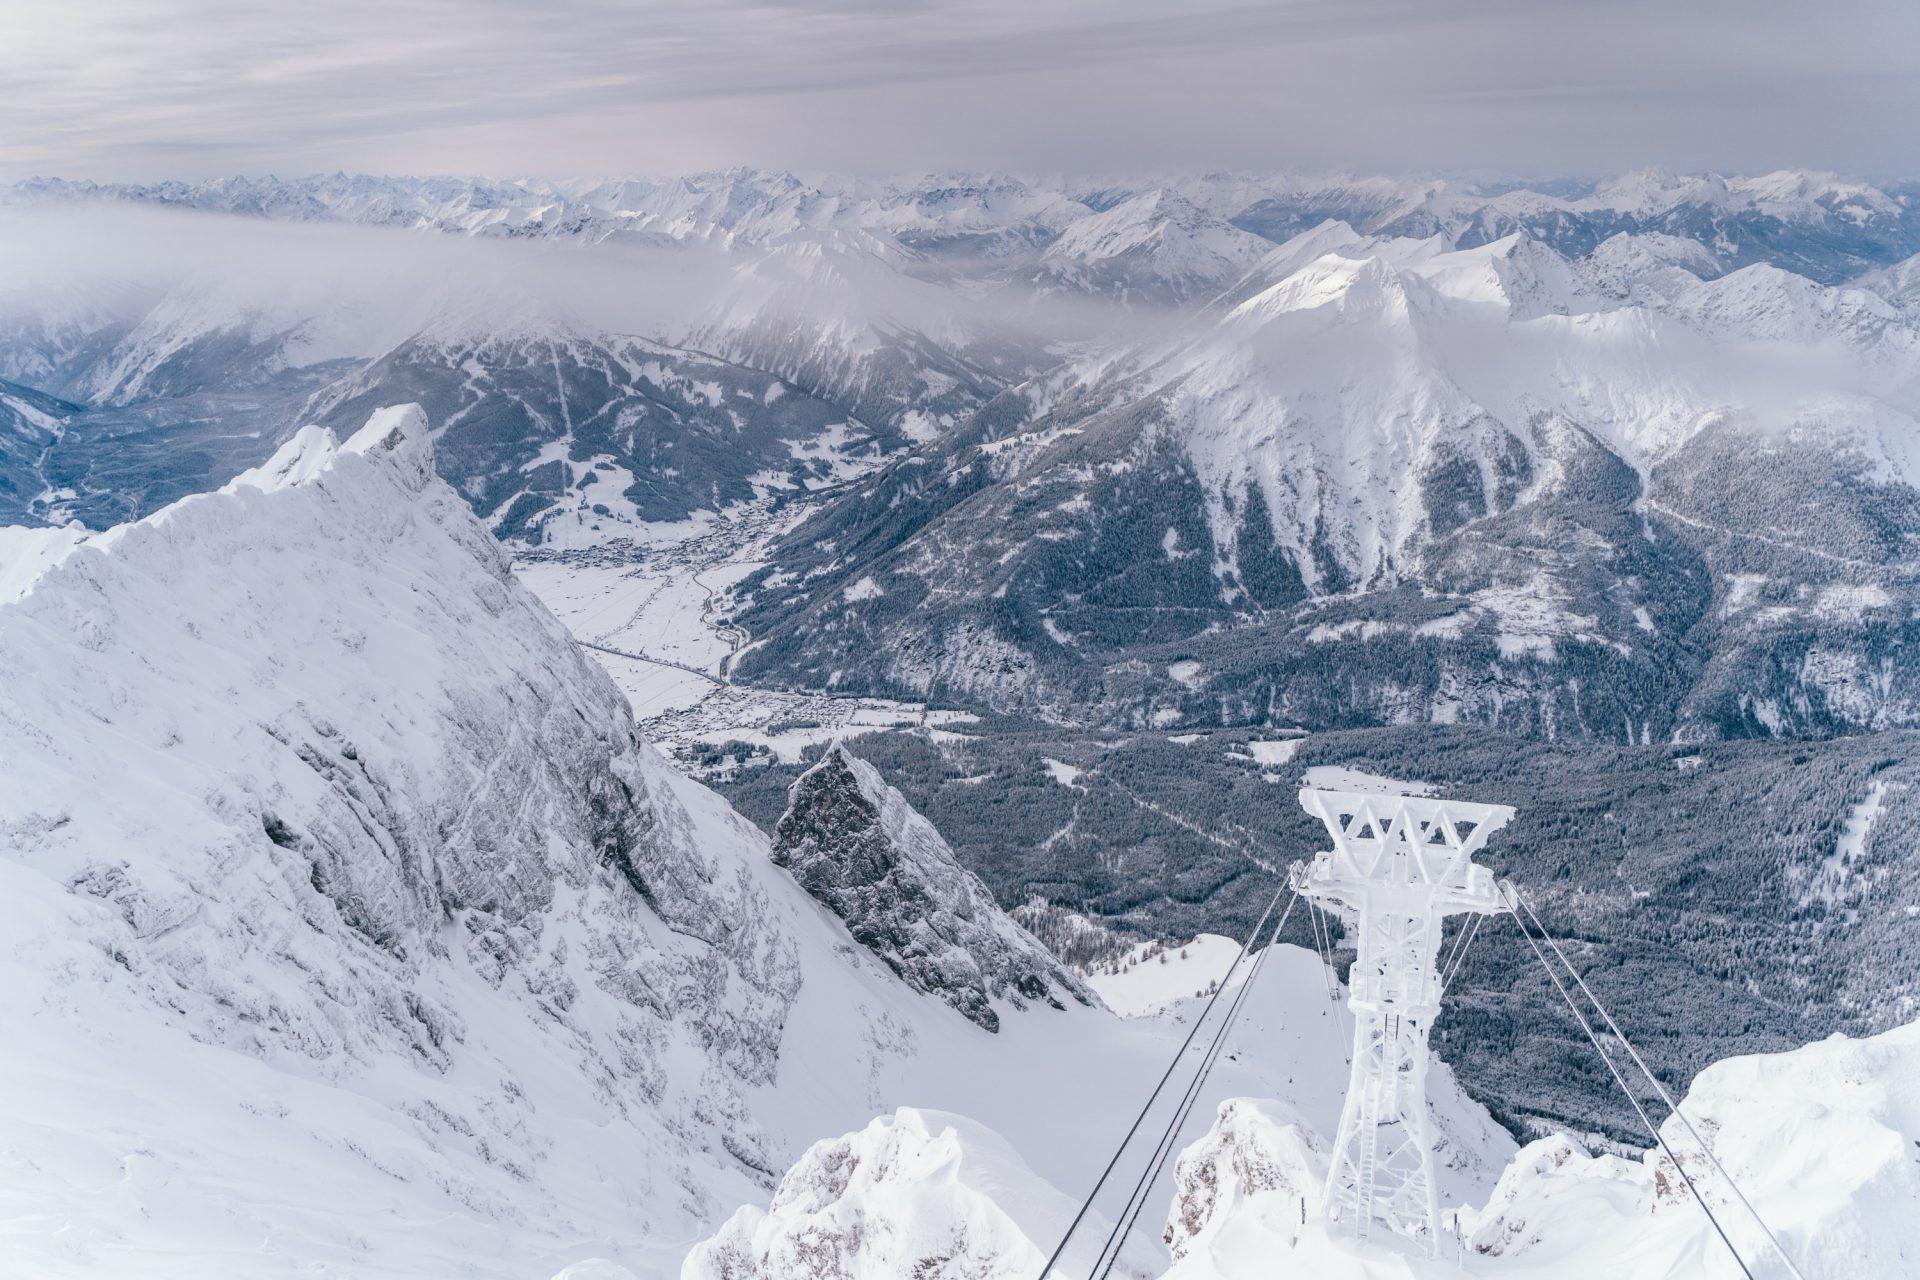 Tiroler Zugspitz Arena winter